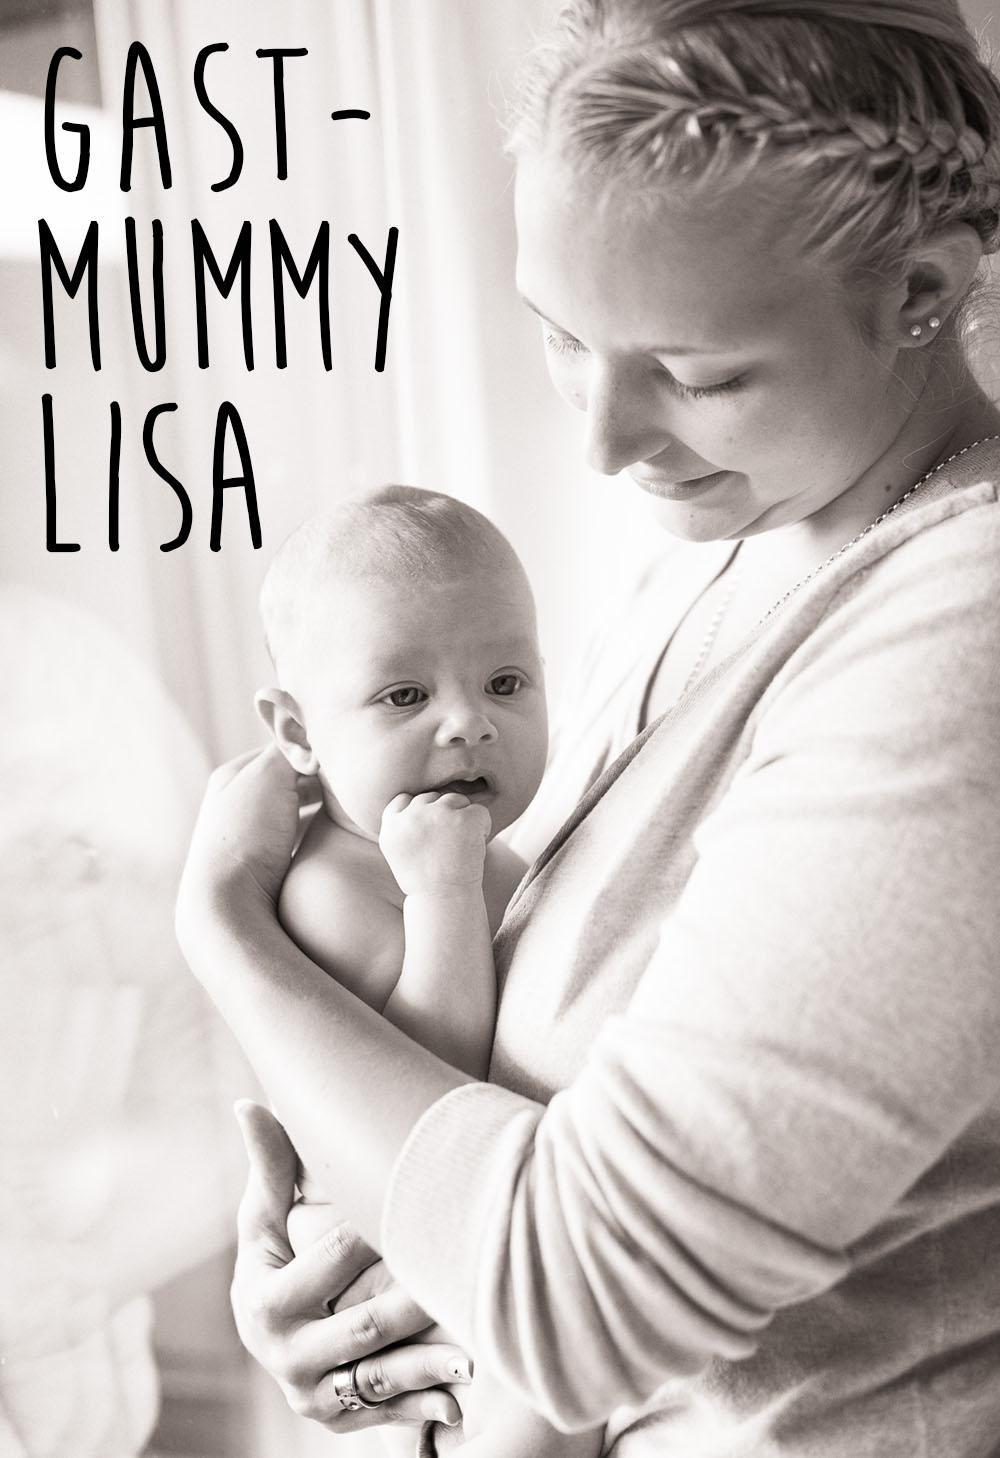 Gast_Mummy_Lisa